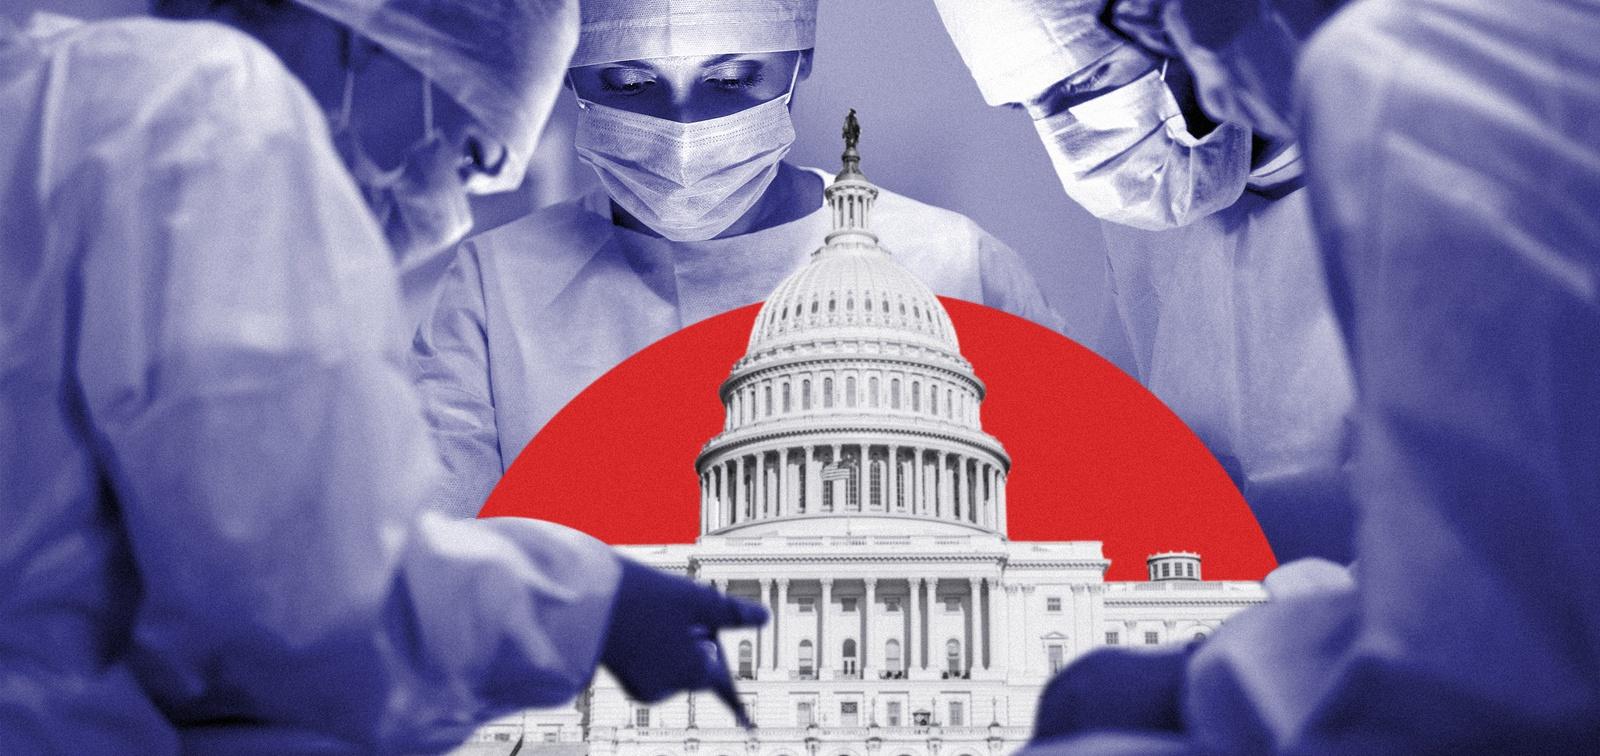 Fitch: Biden's healthcare plans could boost nonprofit hospitals